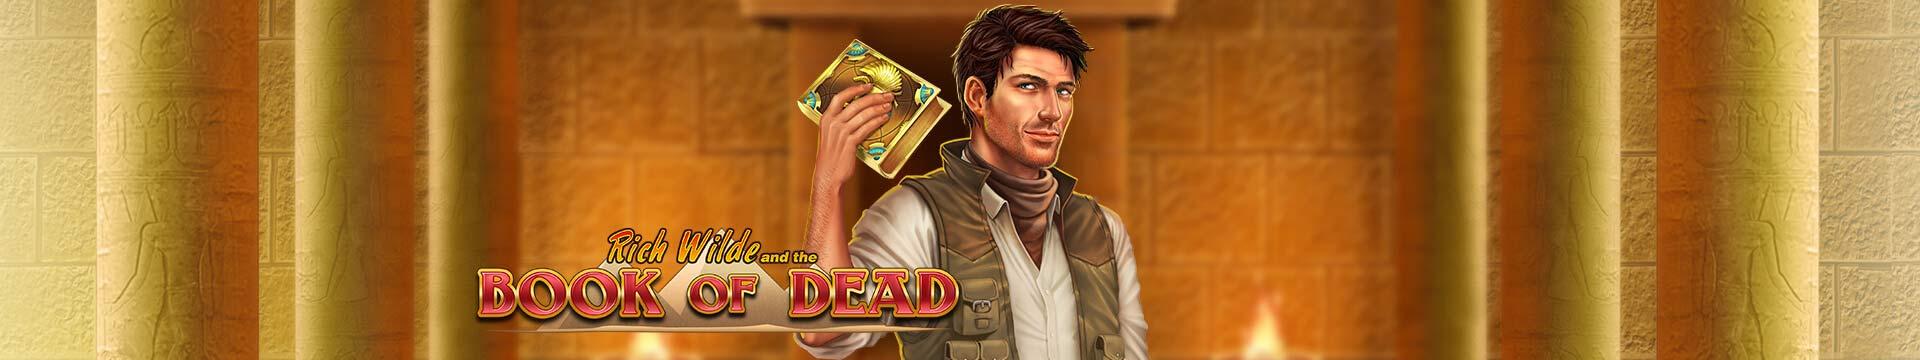 Slider Banner - Book of Dead 2